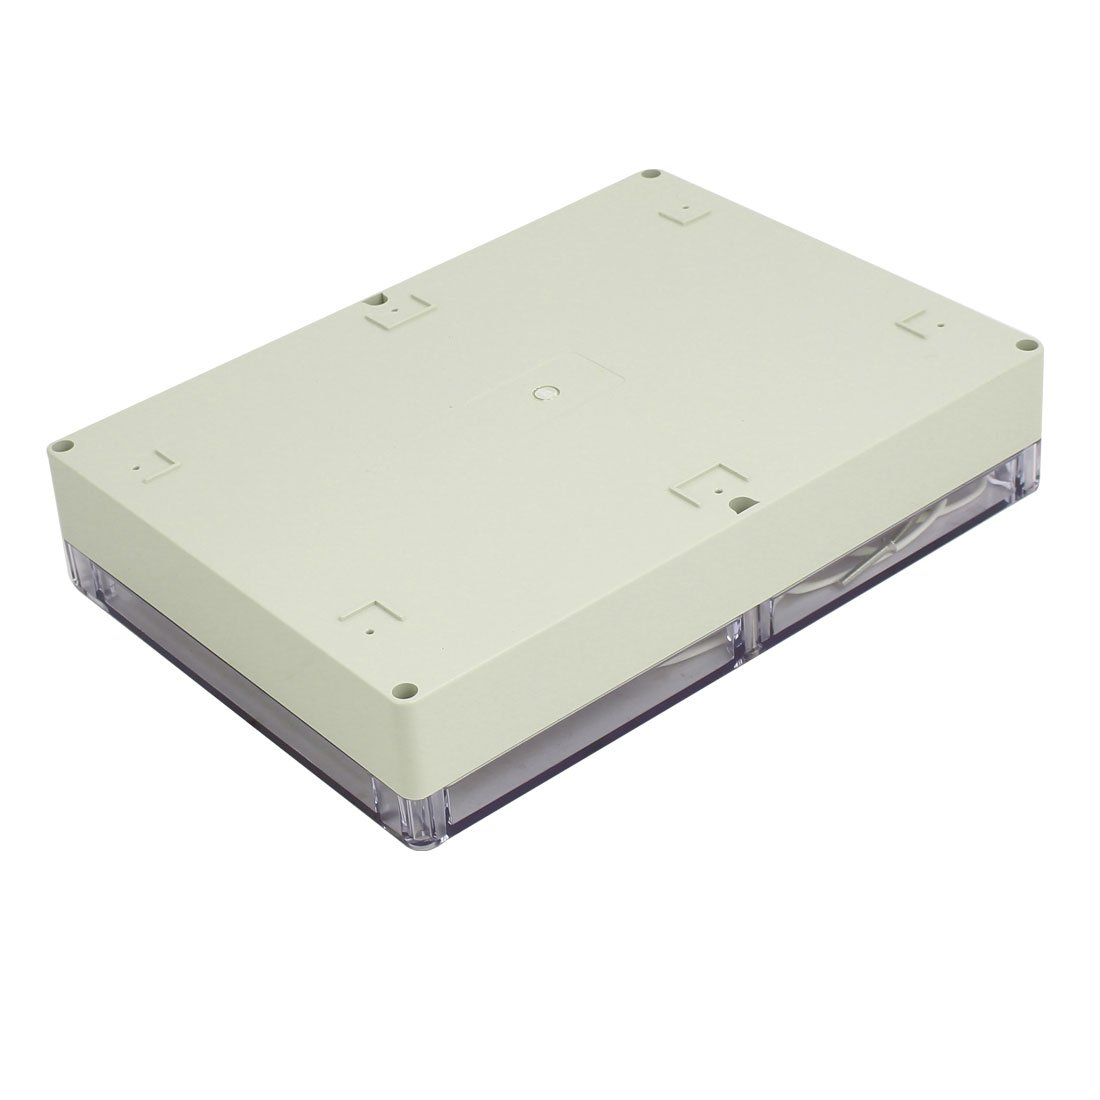 sourcing map Caja de empalmes el/éctricos de 290mm x 210mm x 60mm cubierta transparente ABS a prueba de polvo IP65